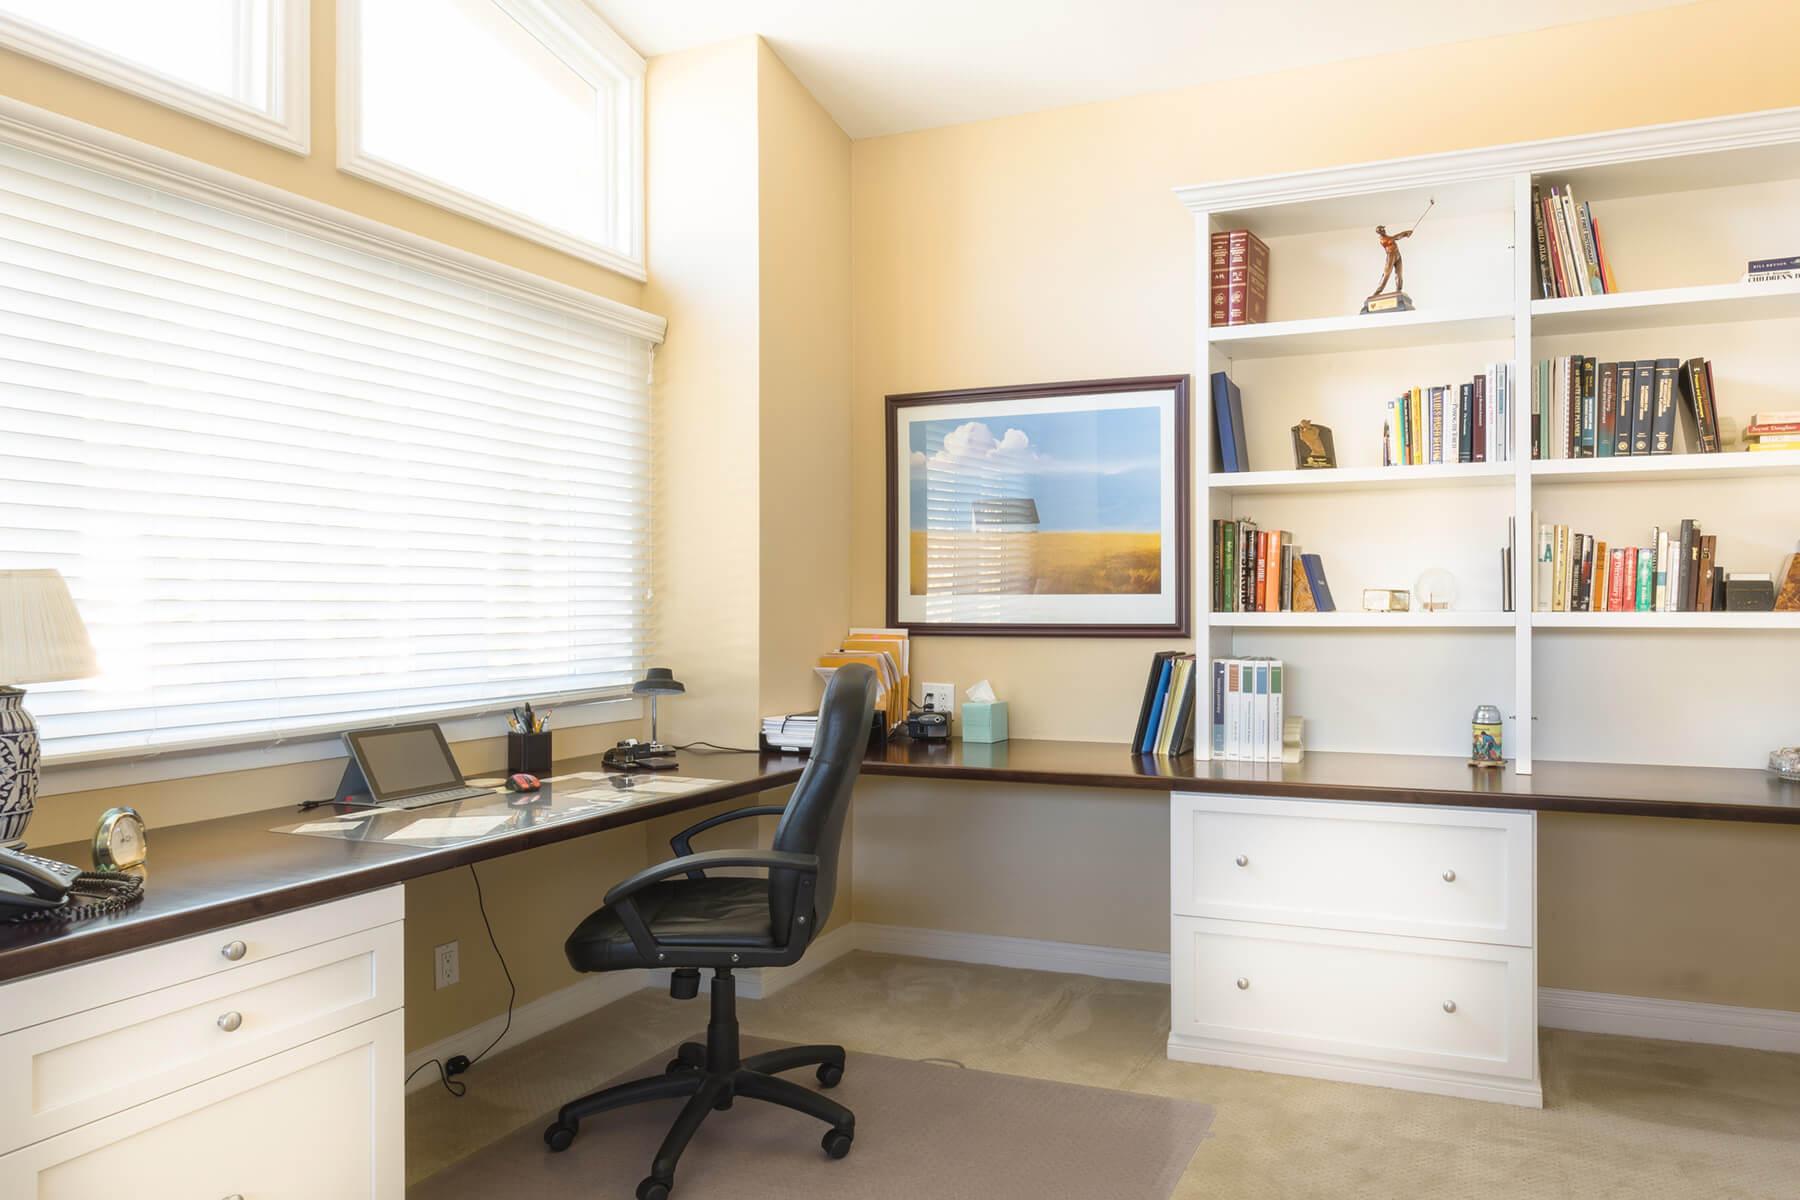 26 Home Office Designs Desks  Shelving by Closet Factory